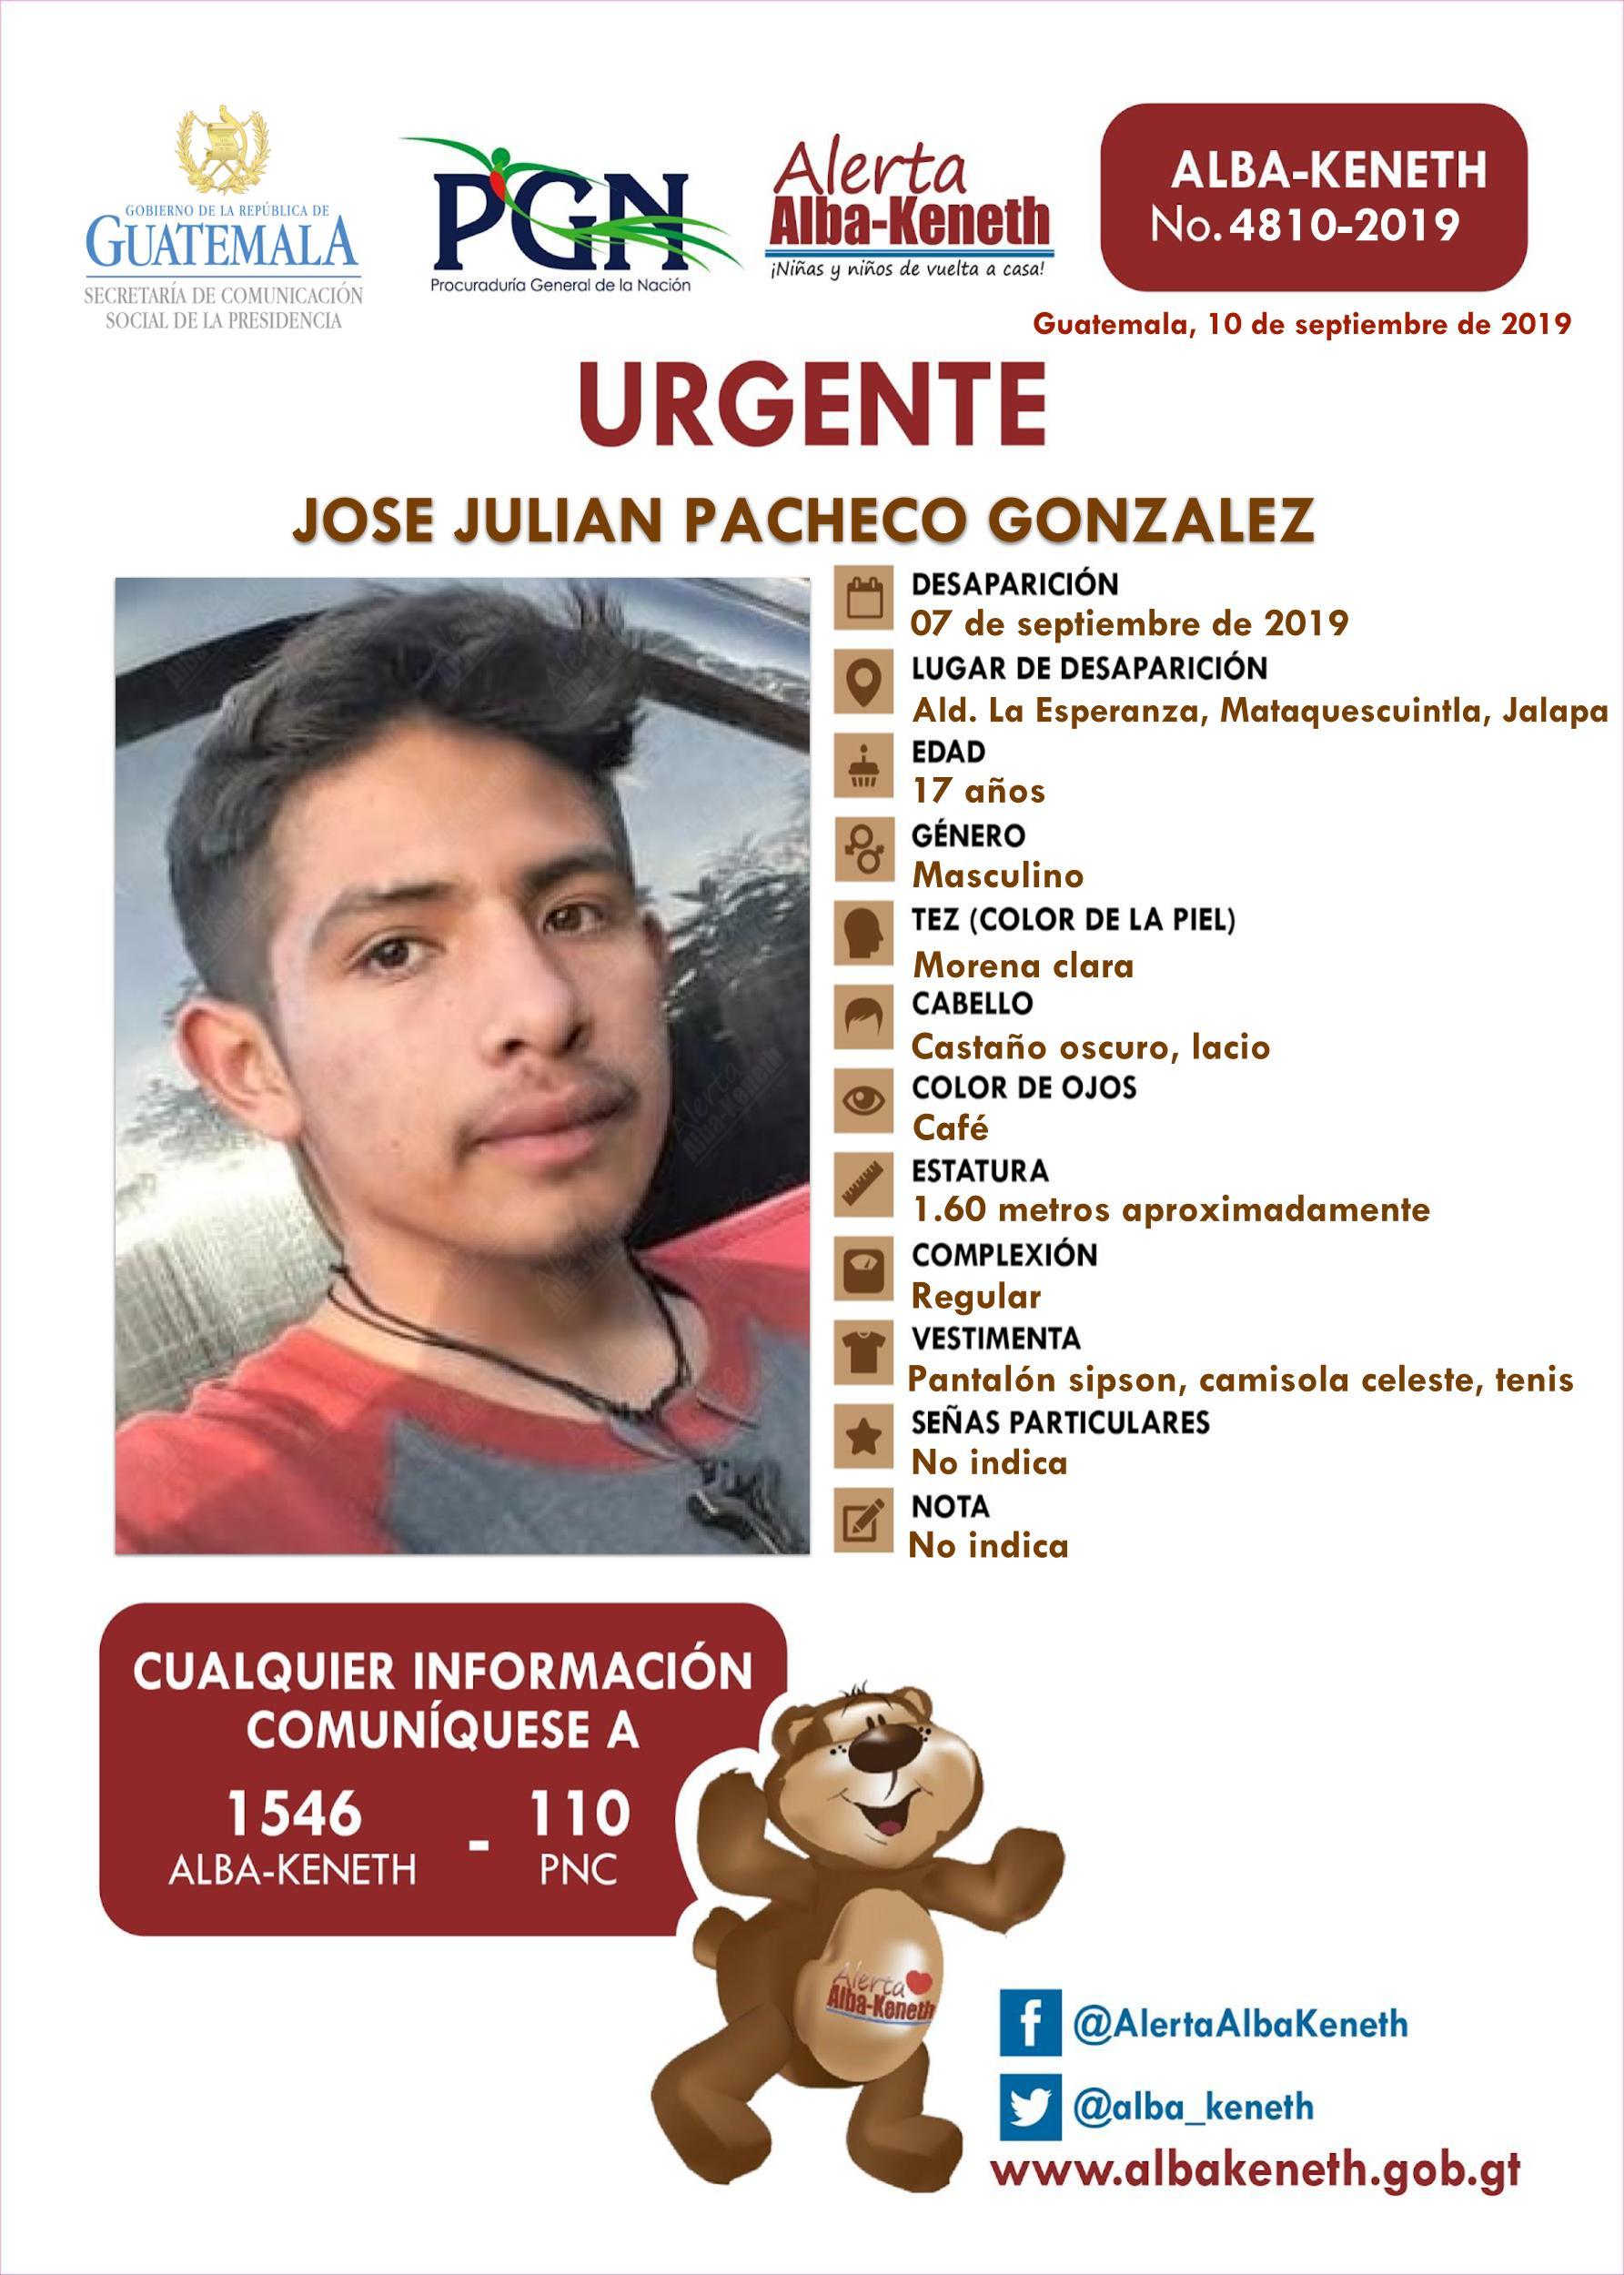 Jose Jualian Pacheco Gonzalez